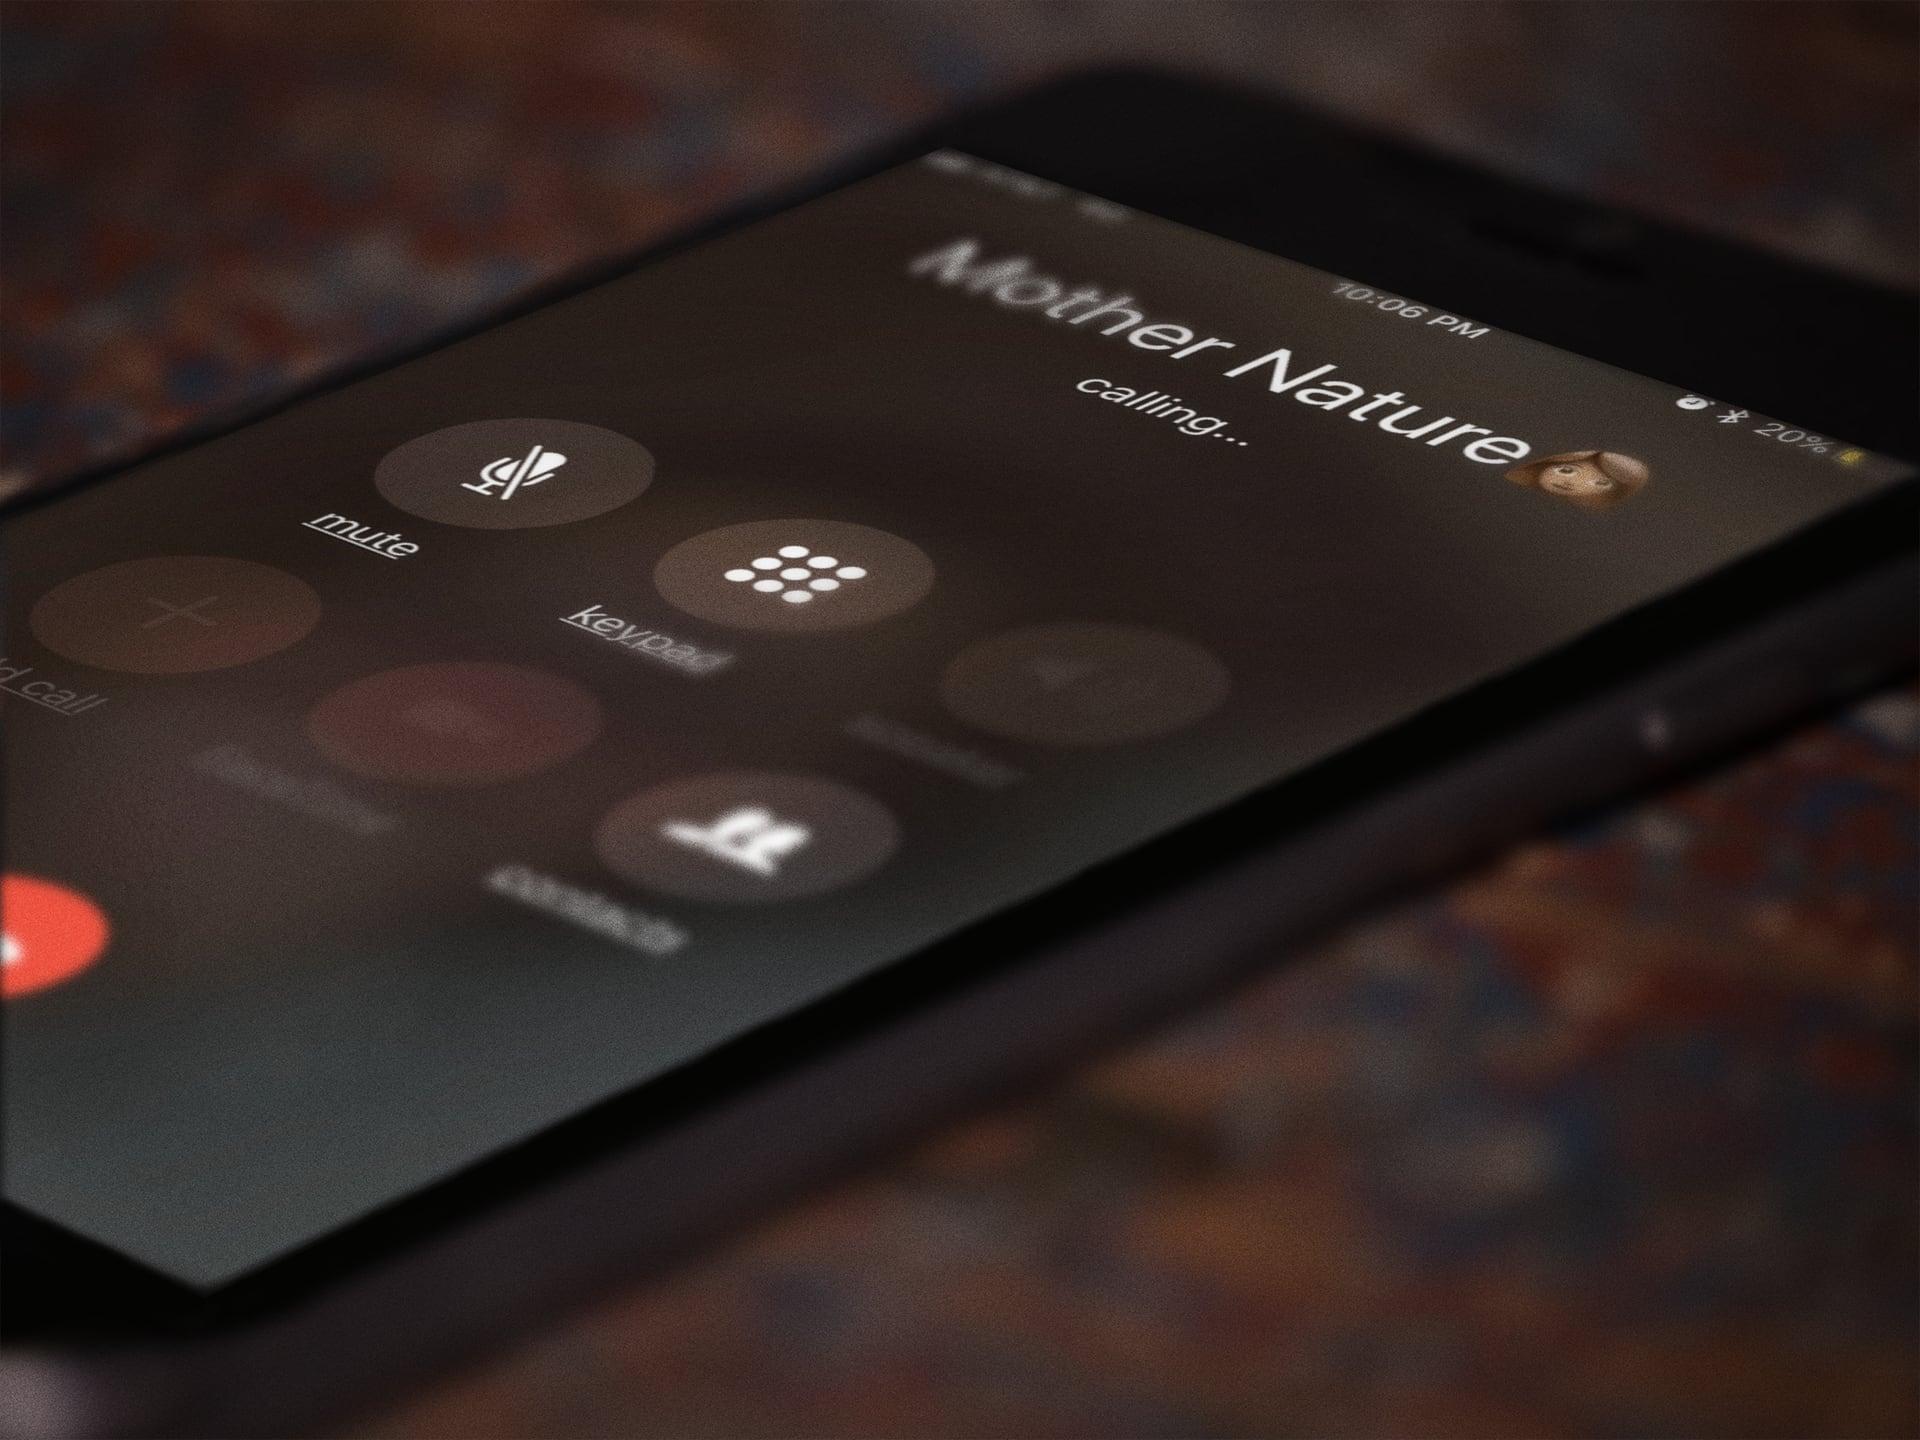 iPhone 7 com a doença do loop